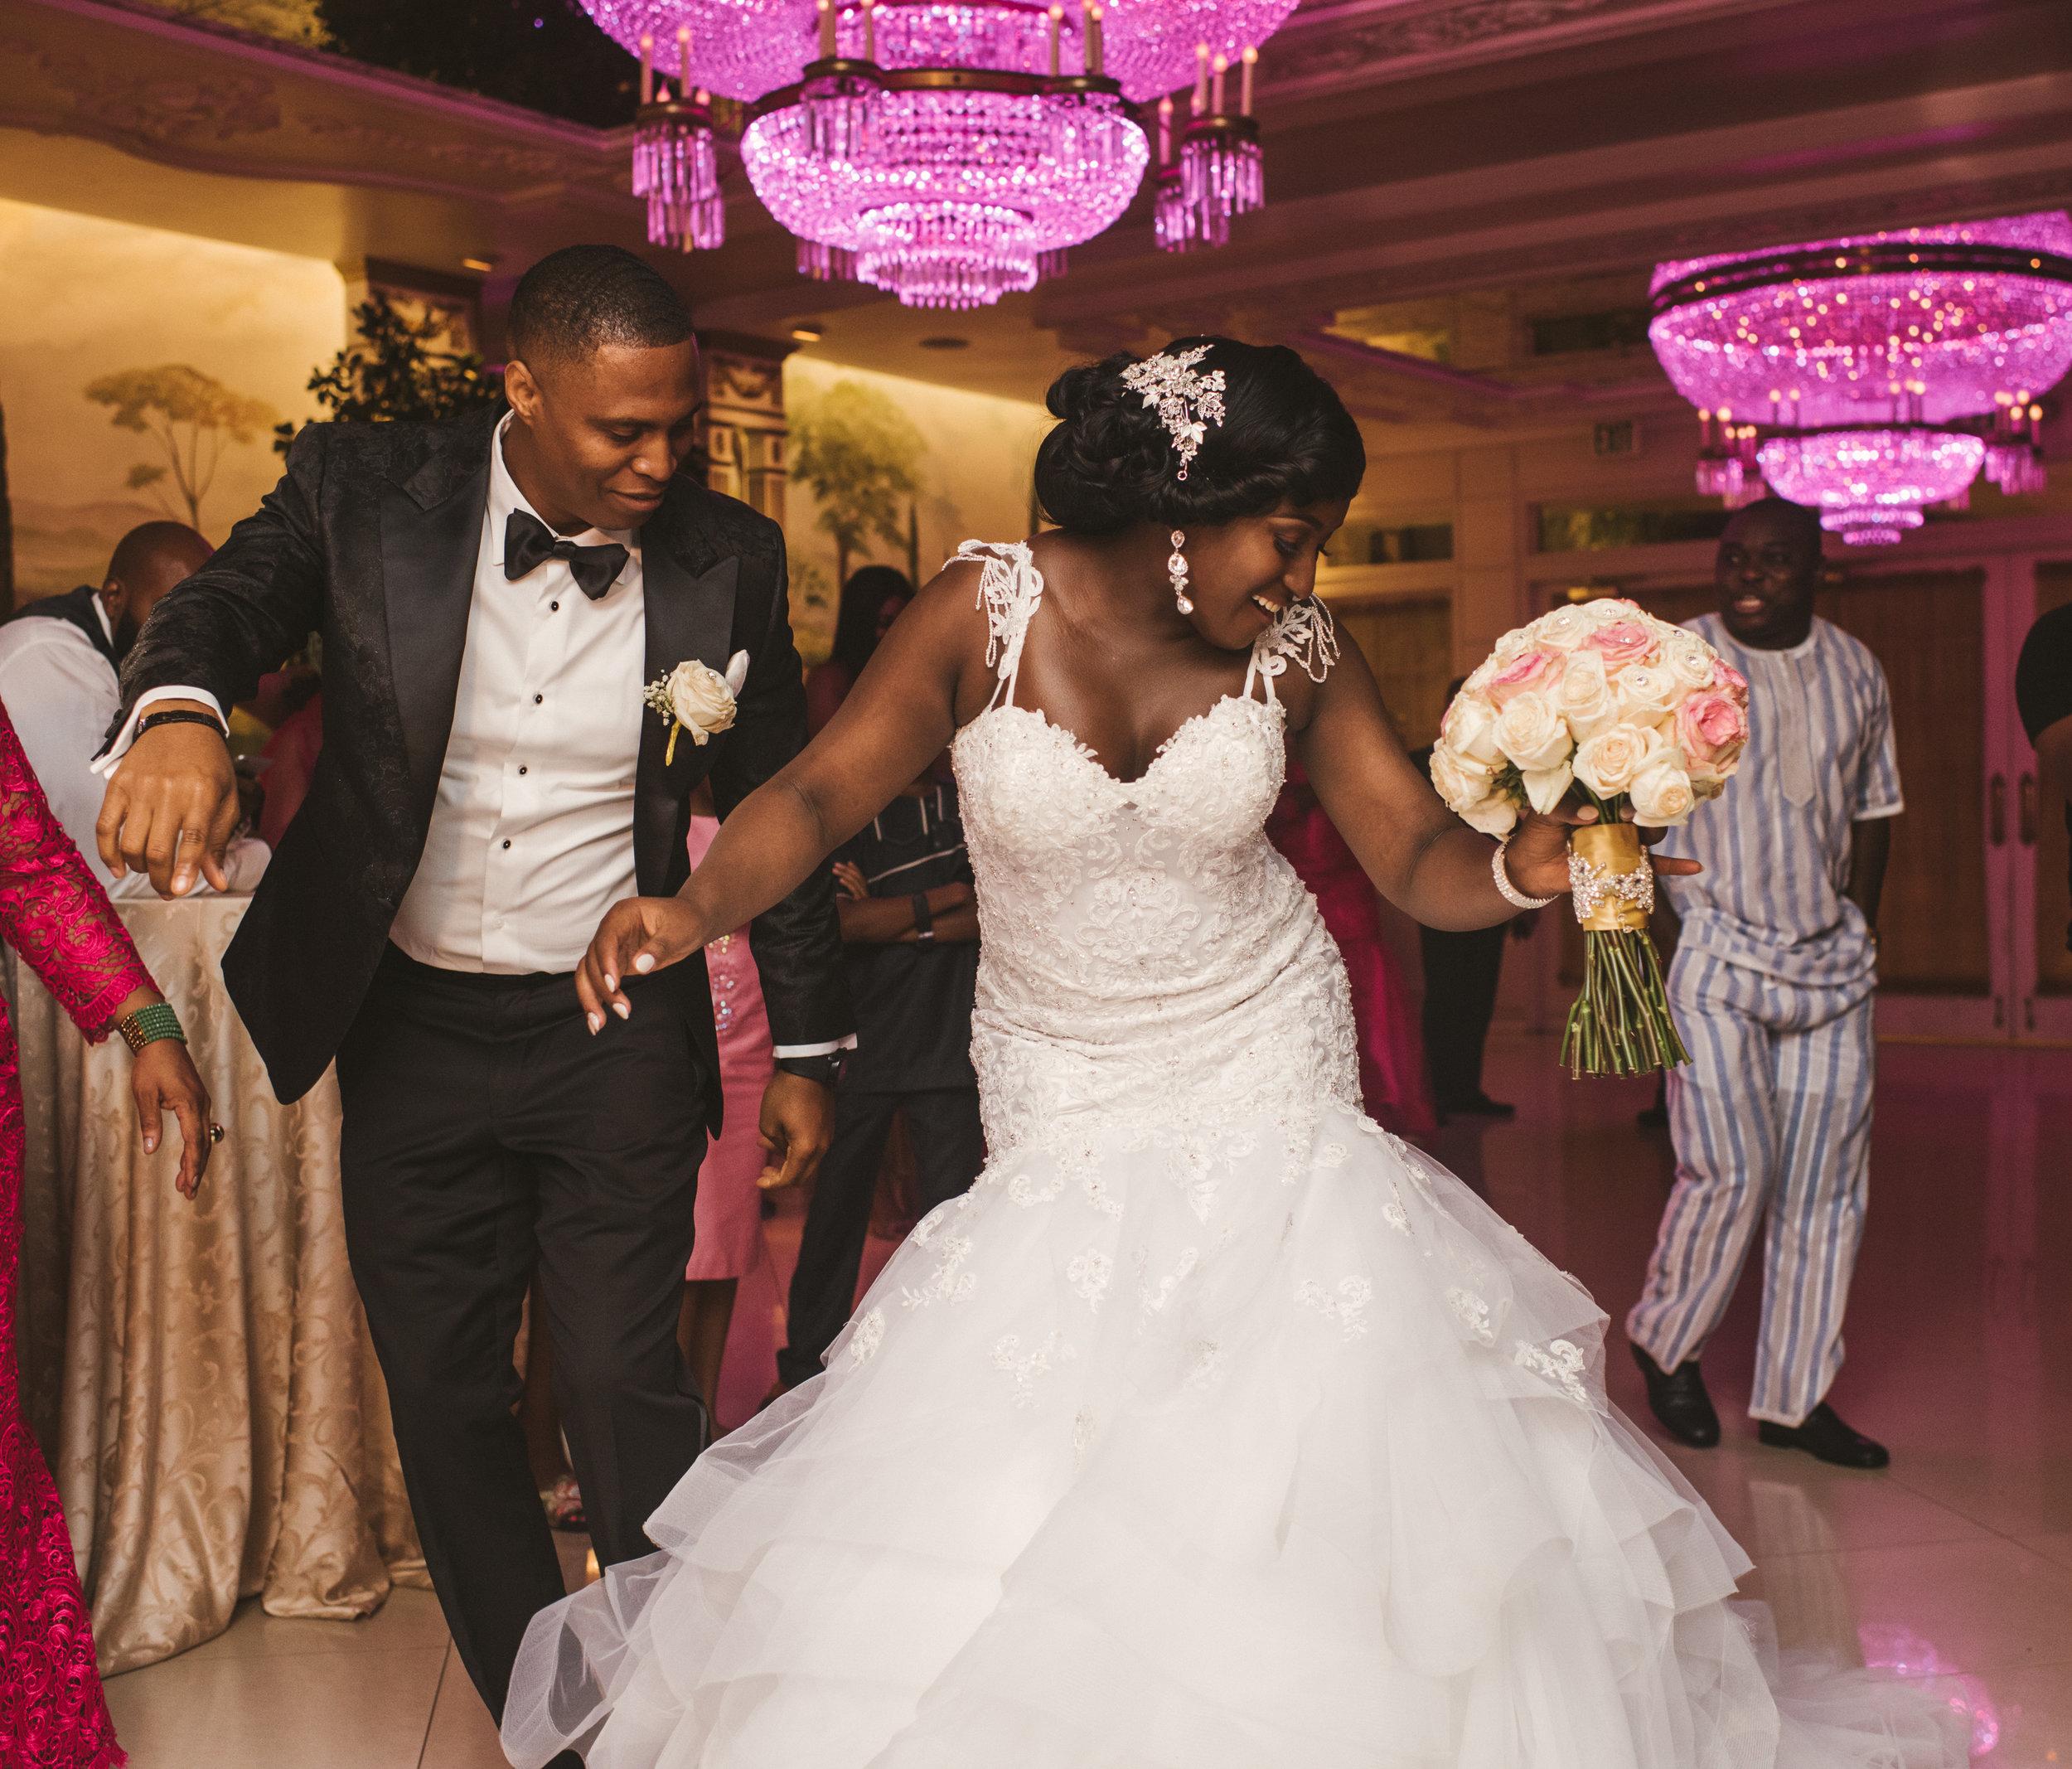 NEW YORK WEDDING PHOTOGRAPHER - TWOTWENTY by CHI-CHI AGBIM-23.jpg